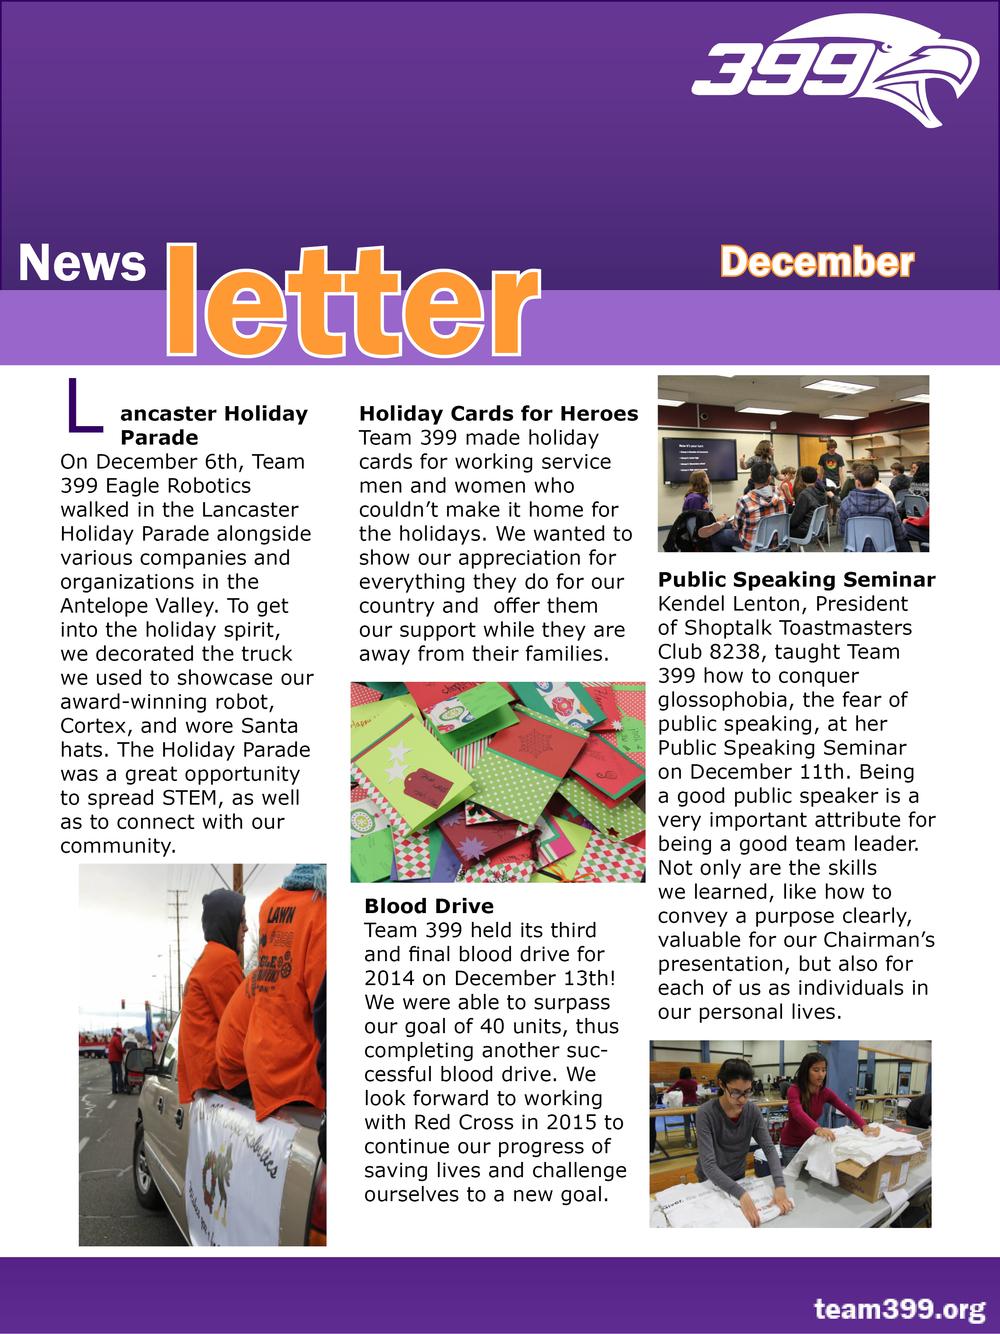 2014 dec newsletter - Copy.jpg